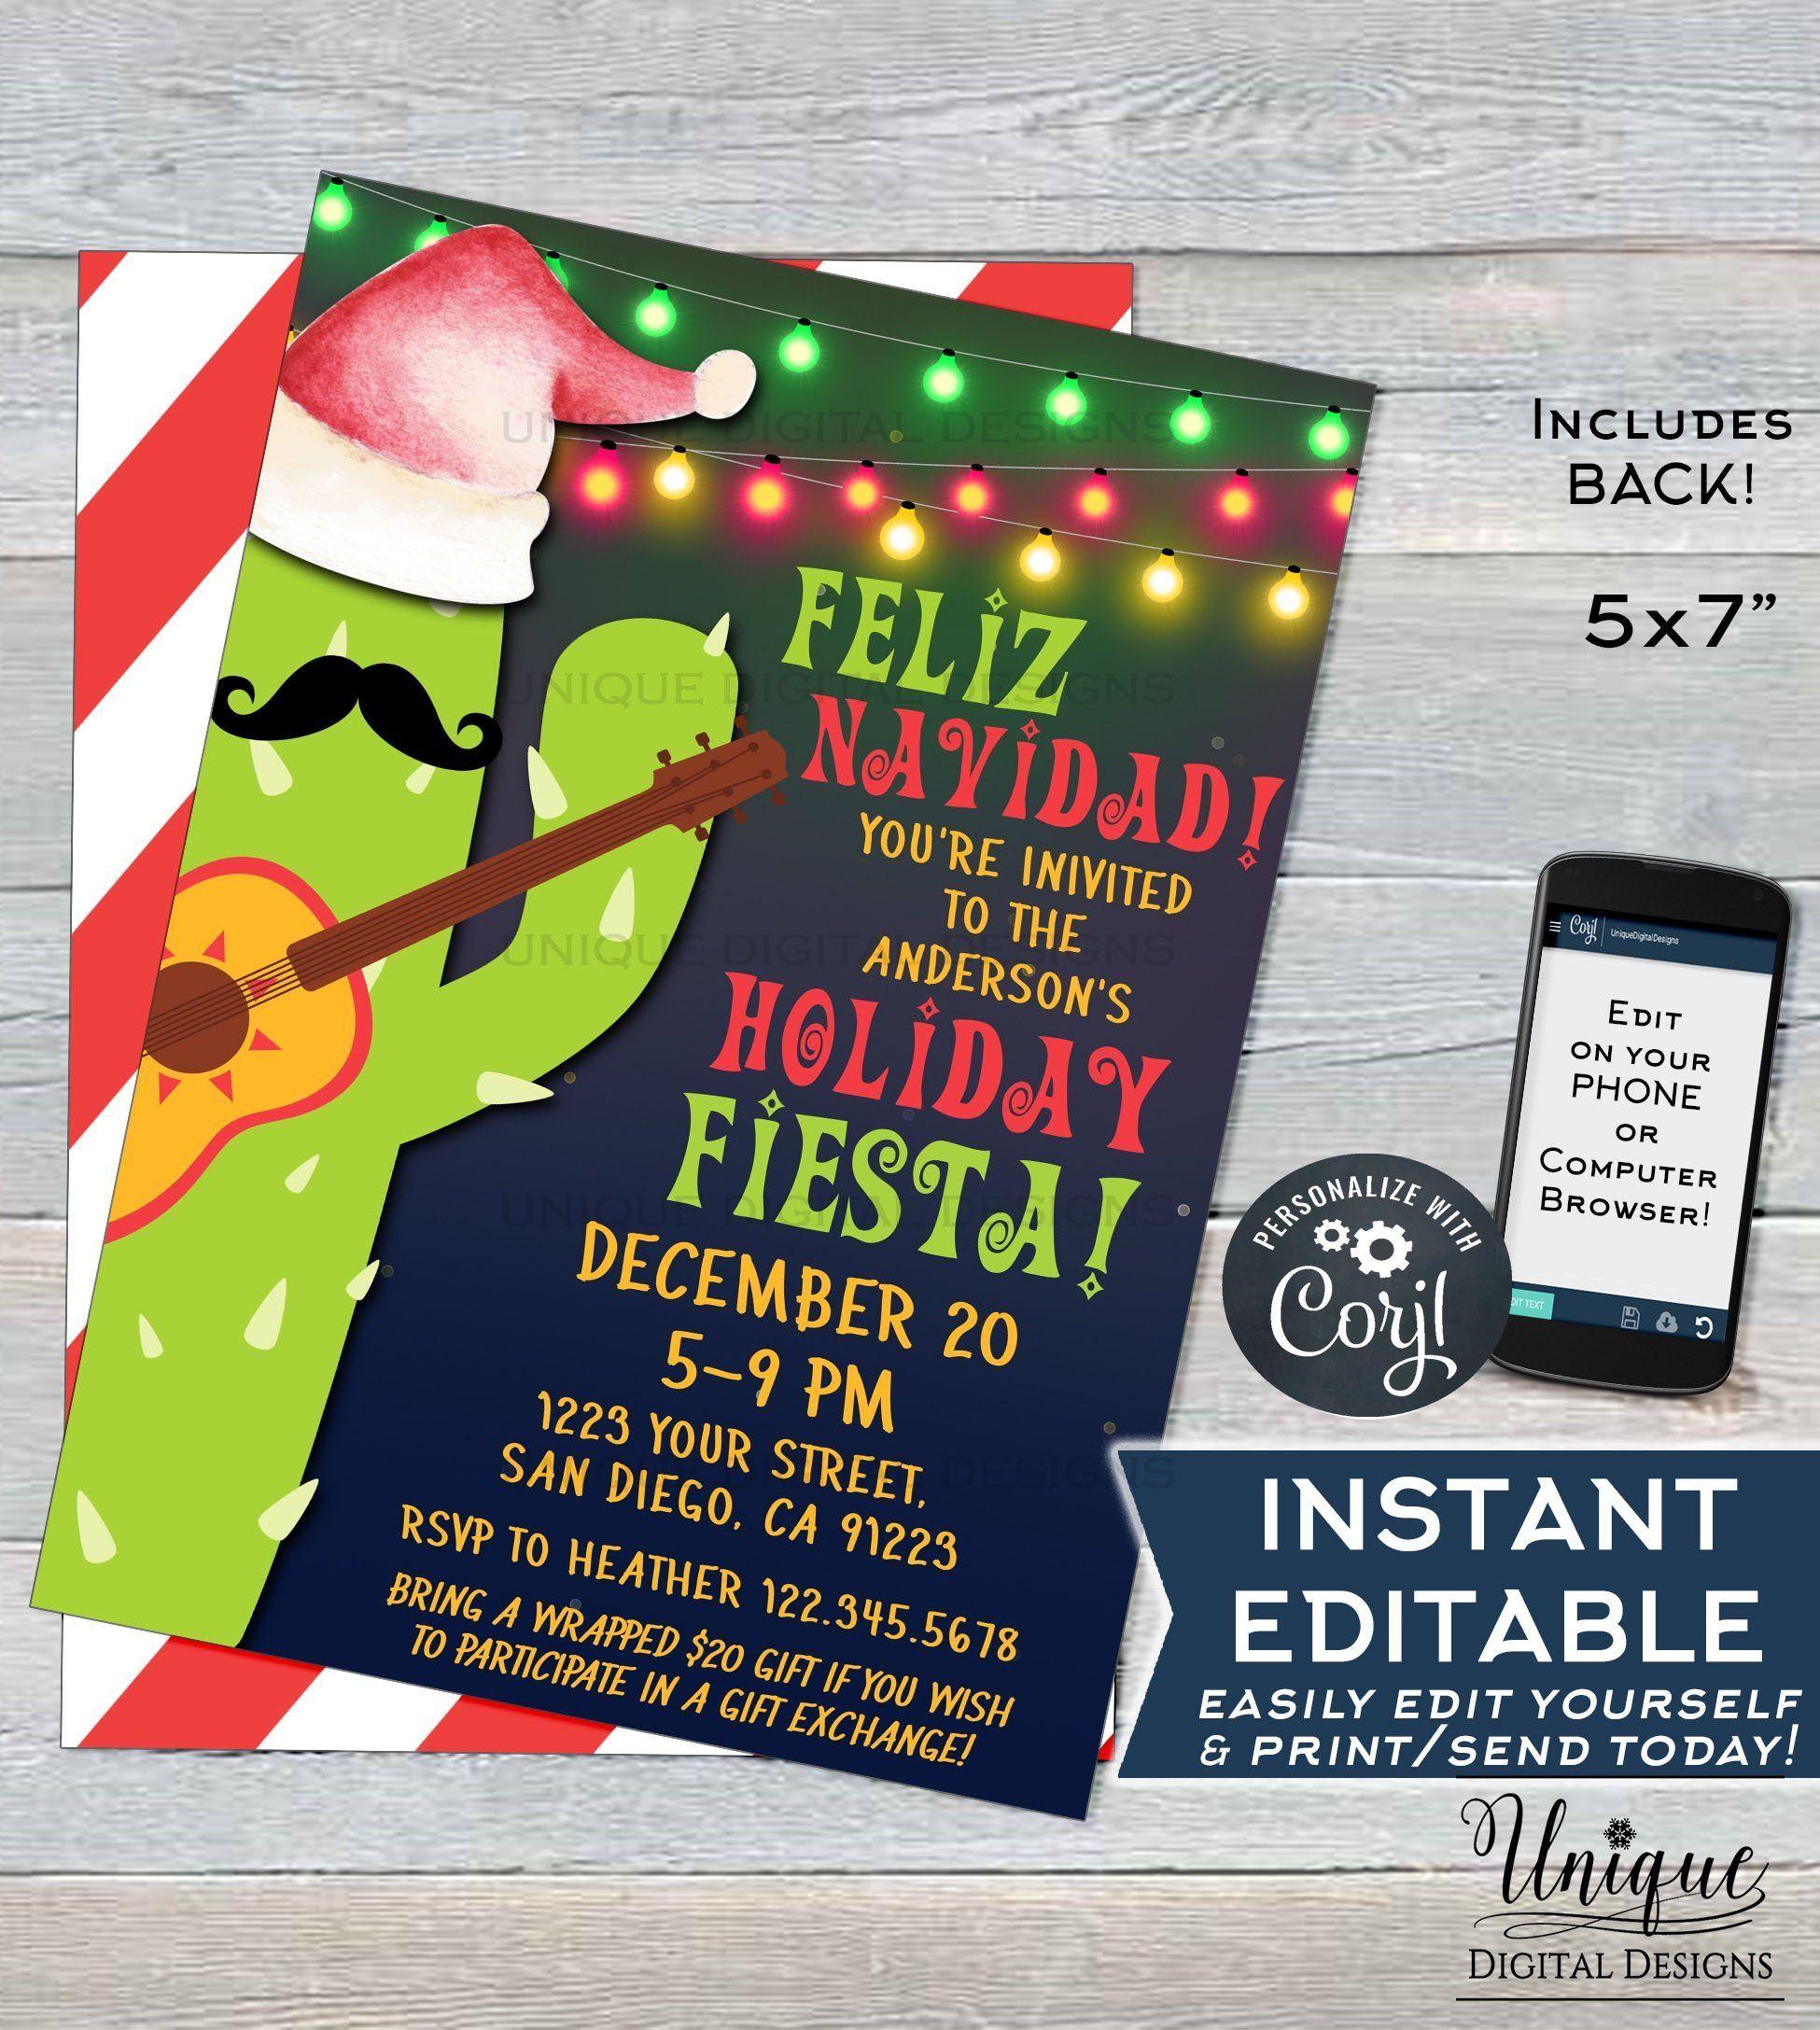 Editable Feliz Navidad Invitation Holiday Fiesta Invitation Mexican Christmas Taco Bout A Party Printable Template Instant Access 5x7 Fiesta Invitations Mexican Christmas Christmas Invitations